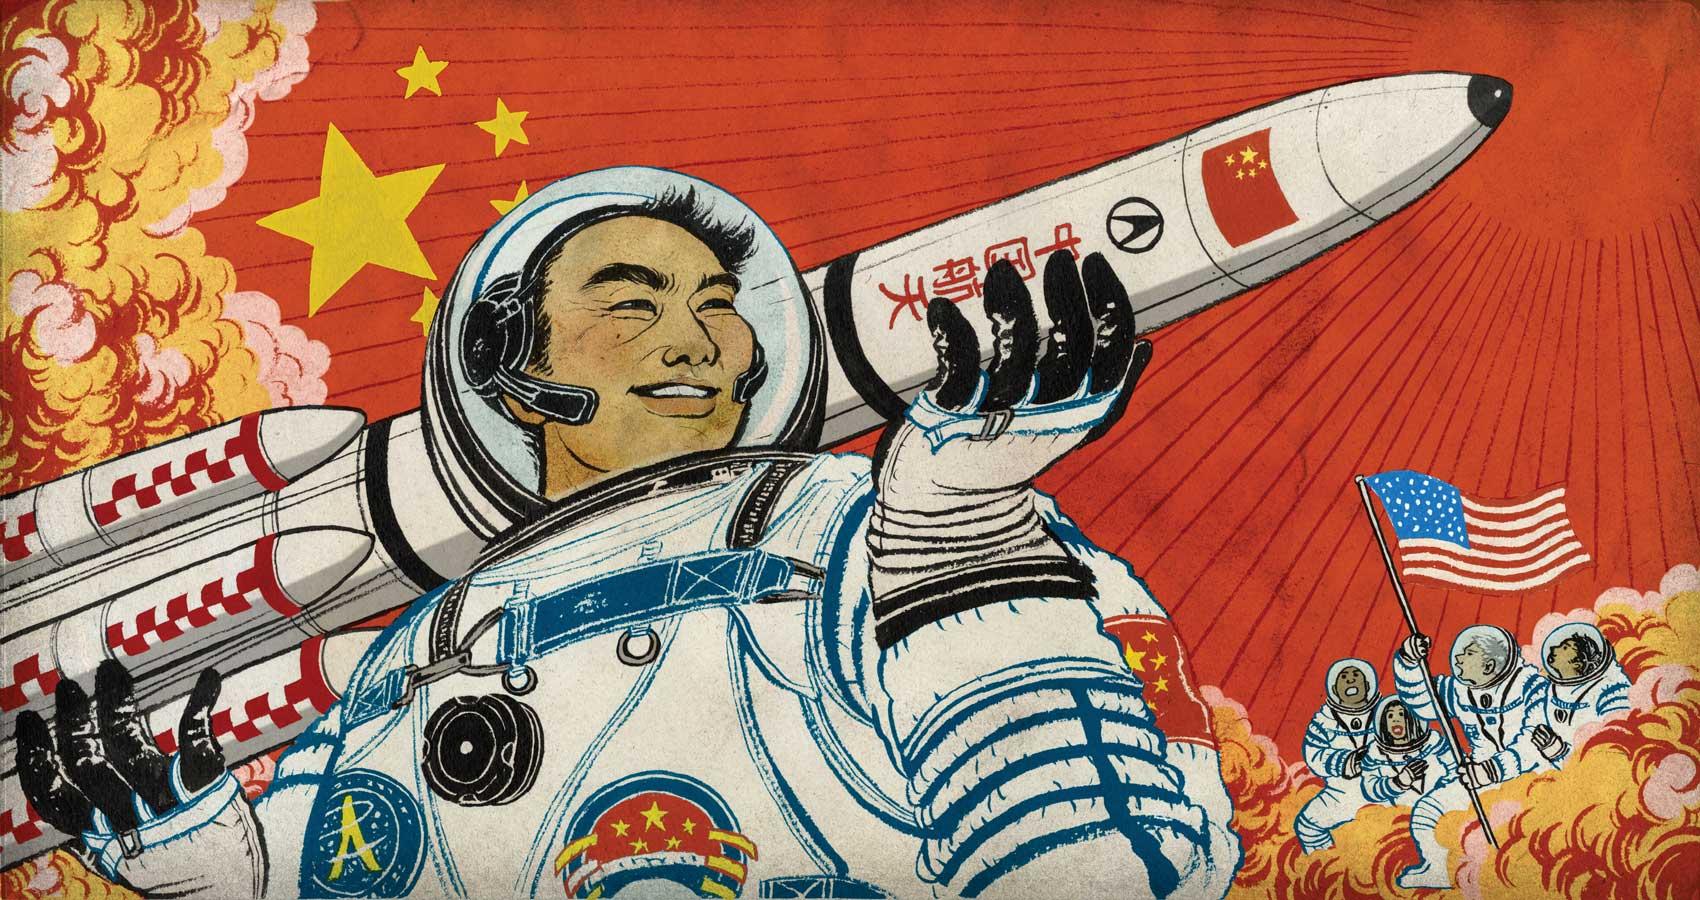 https://i1.wp.com/yukoart.com/wp-content/uploads/2016/10/Chinese_rocket_long_march.jpg